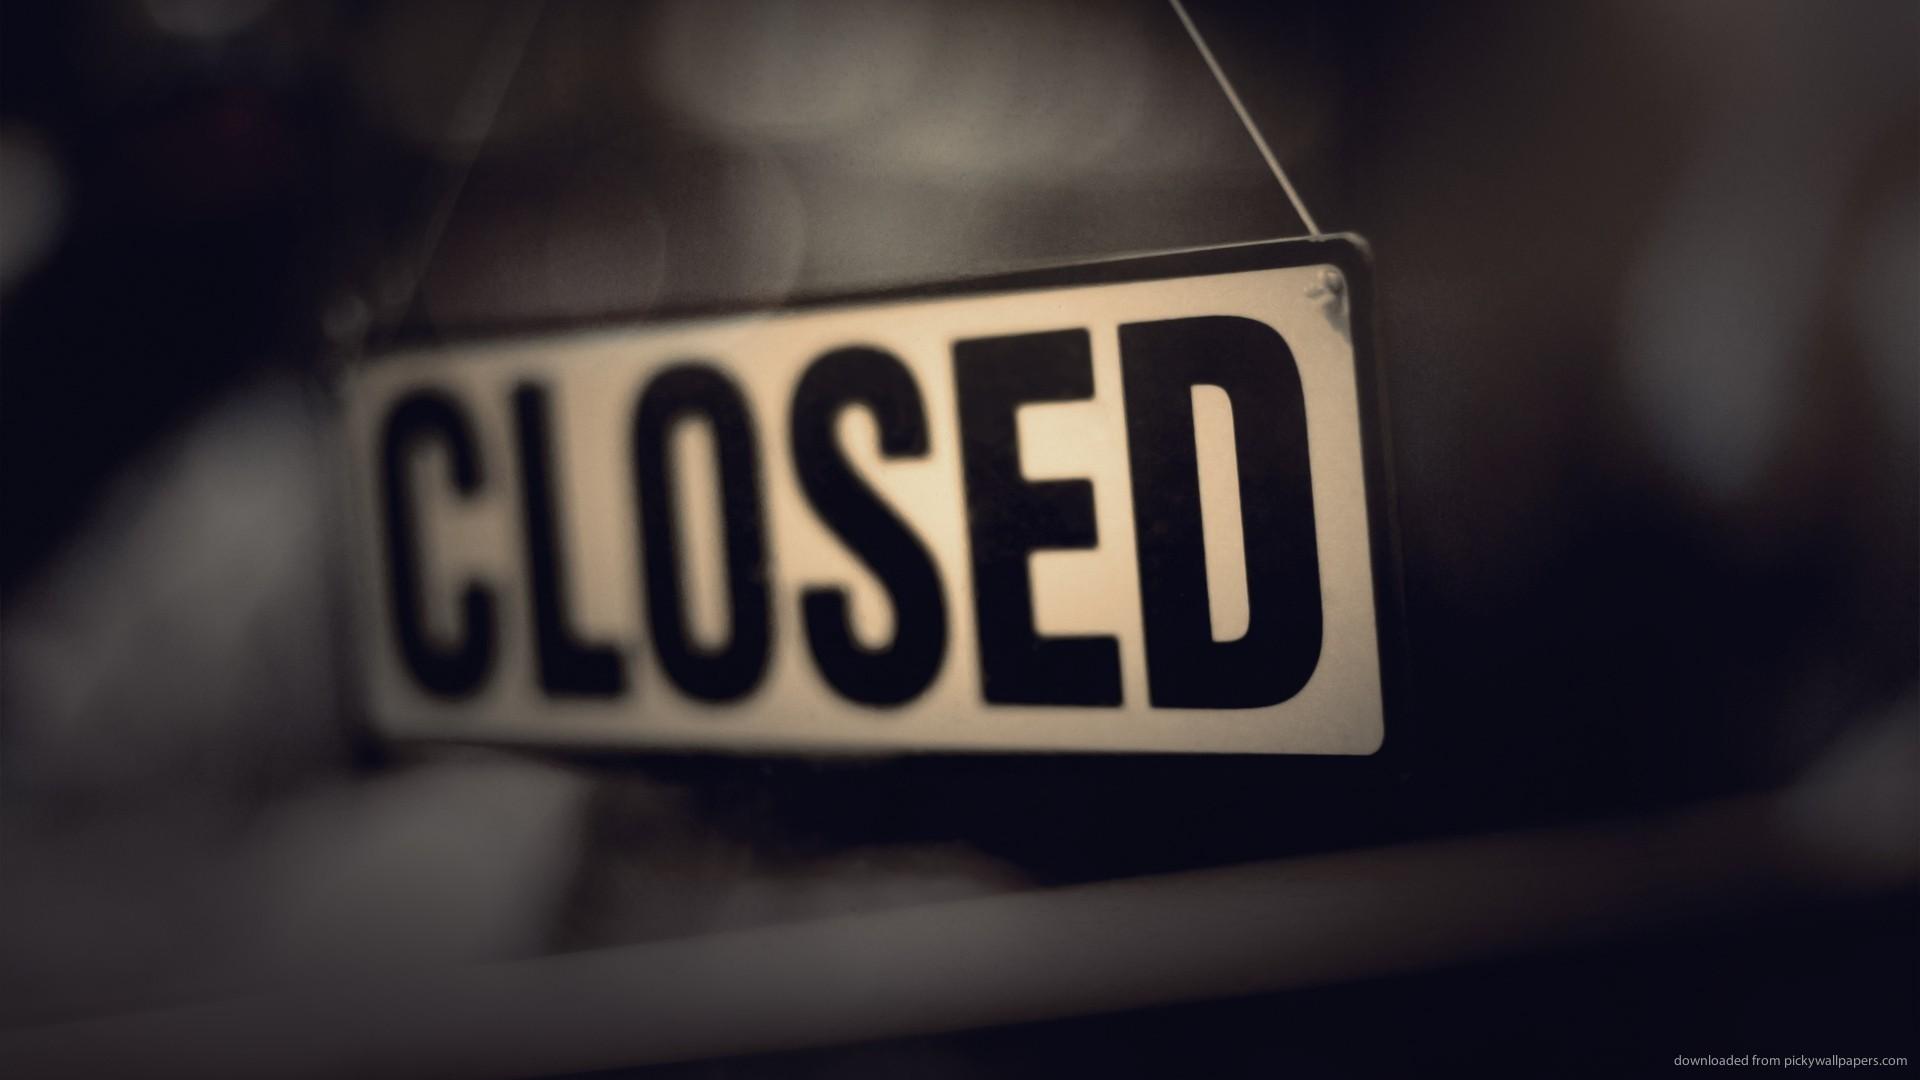 closed-sign.jpg